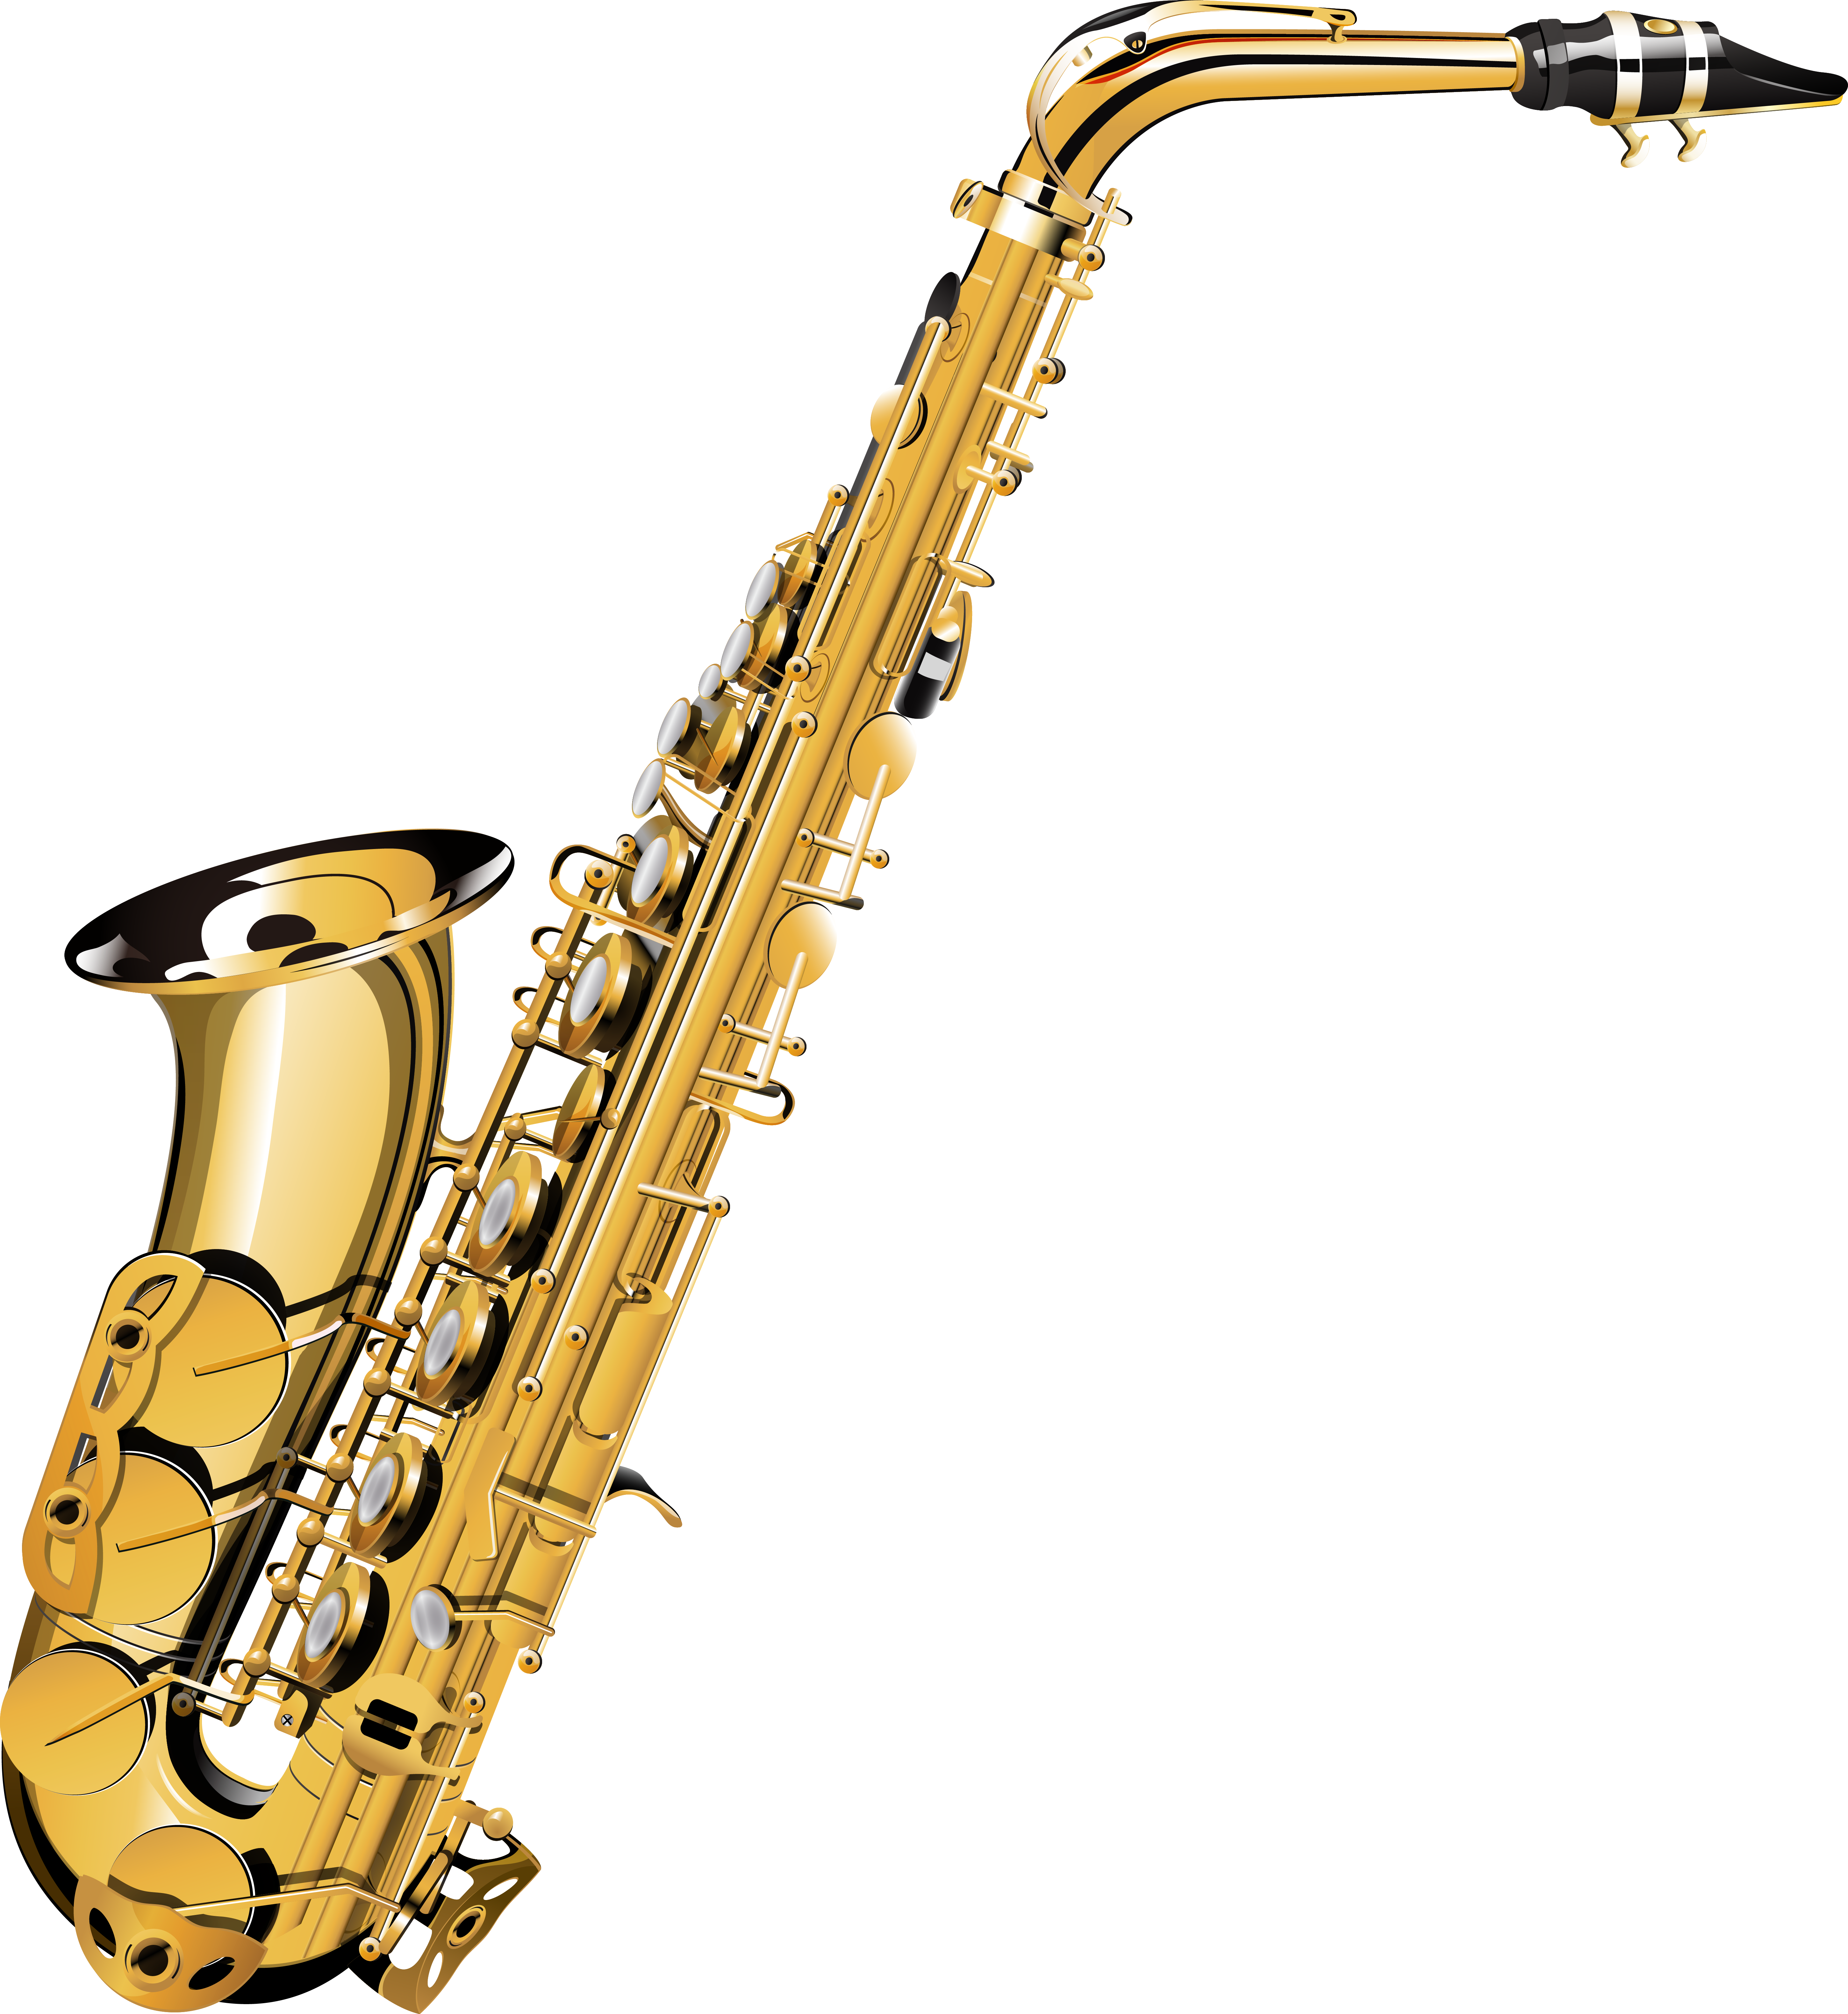 Alto saxophone Musical Instruments Trumpet Tenor saxophone.